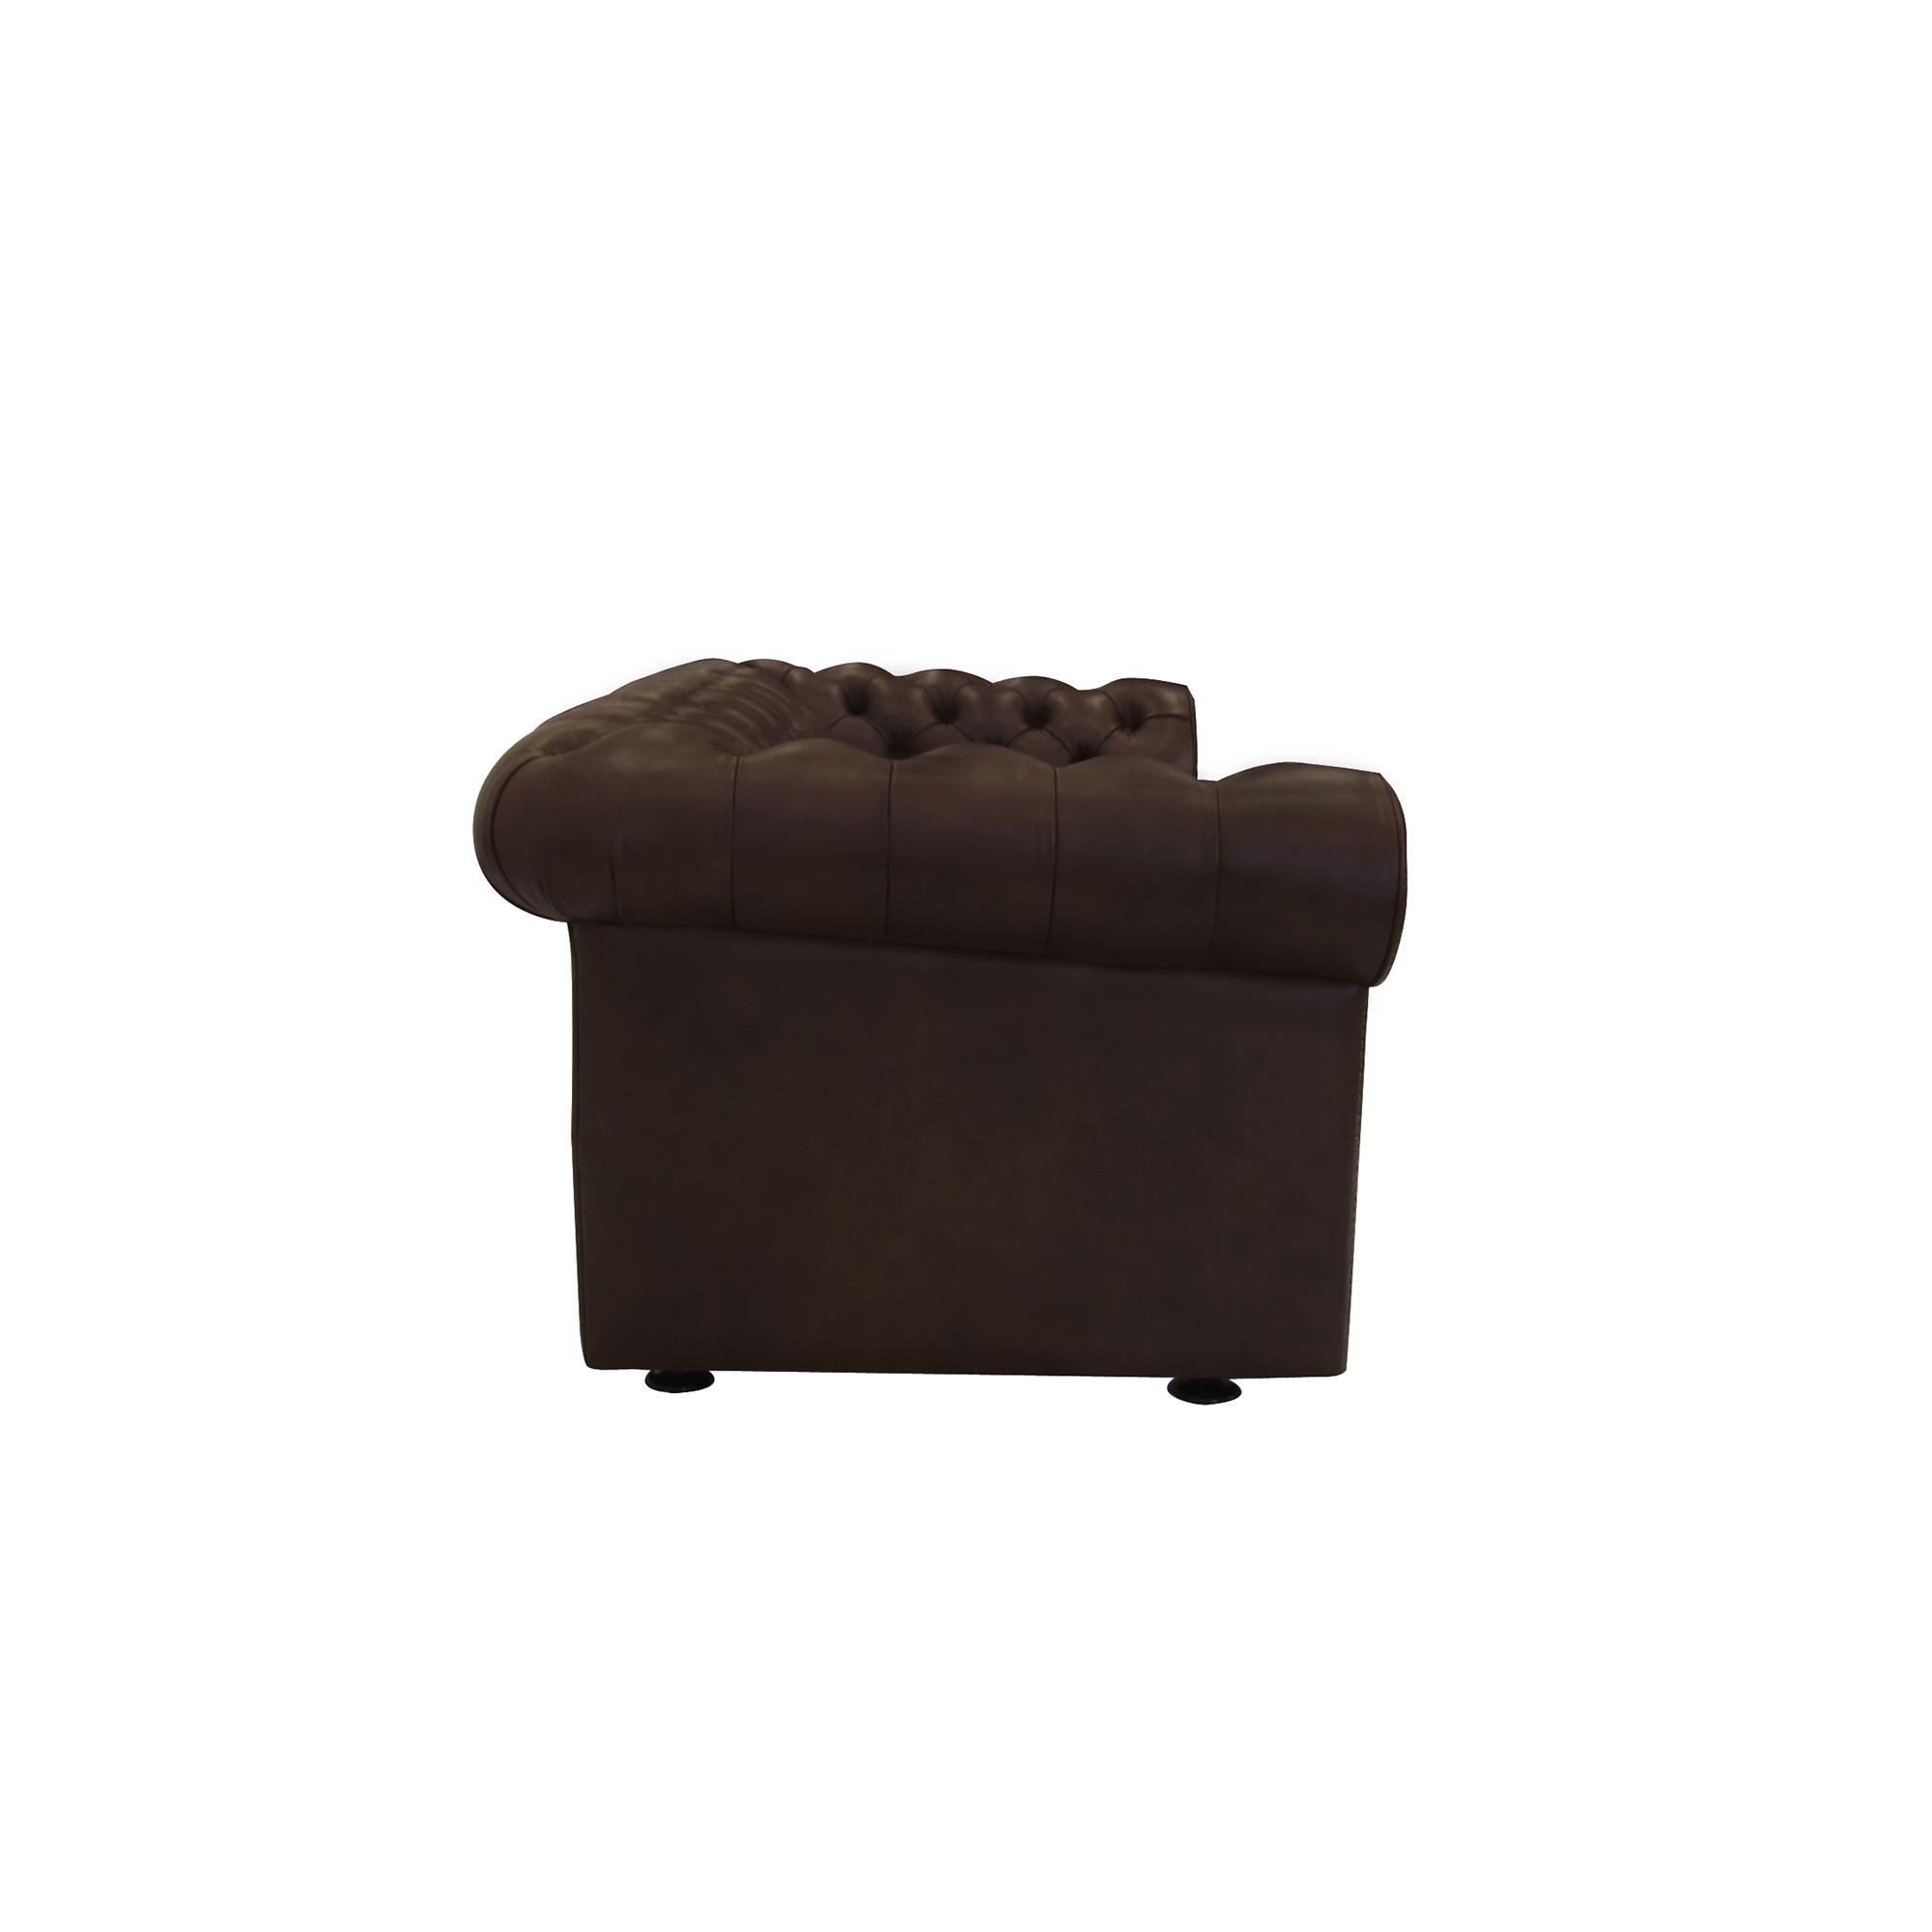 Prime Chester Sofa Moran Furniture Camellatalisay Diy Chair Ideas Camellatalisaycom